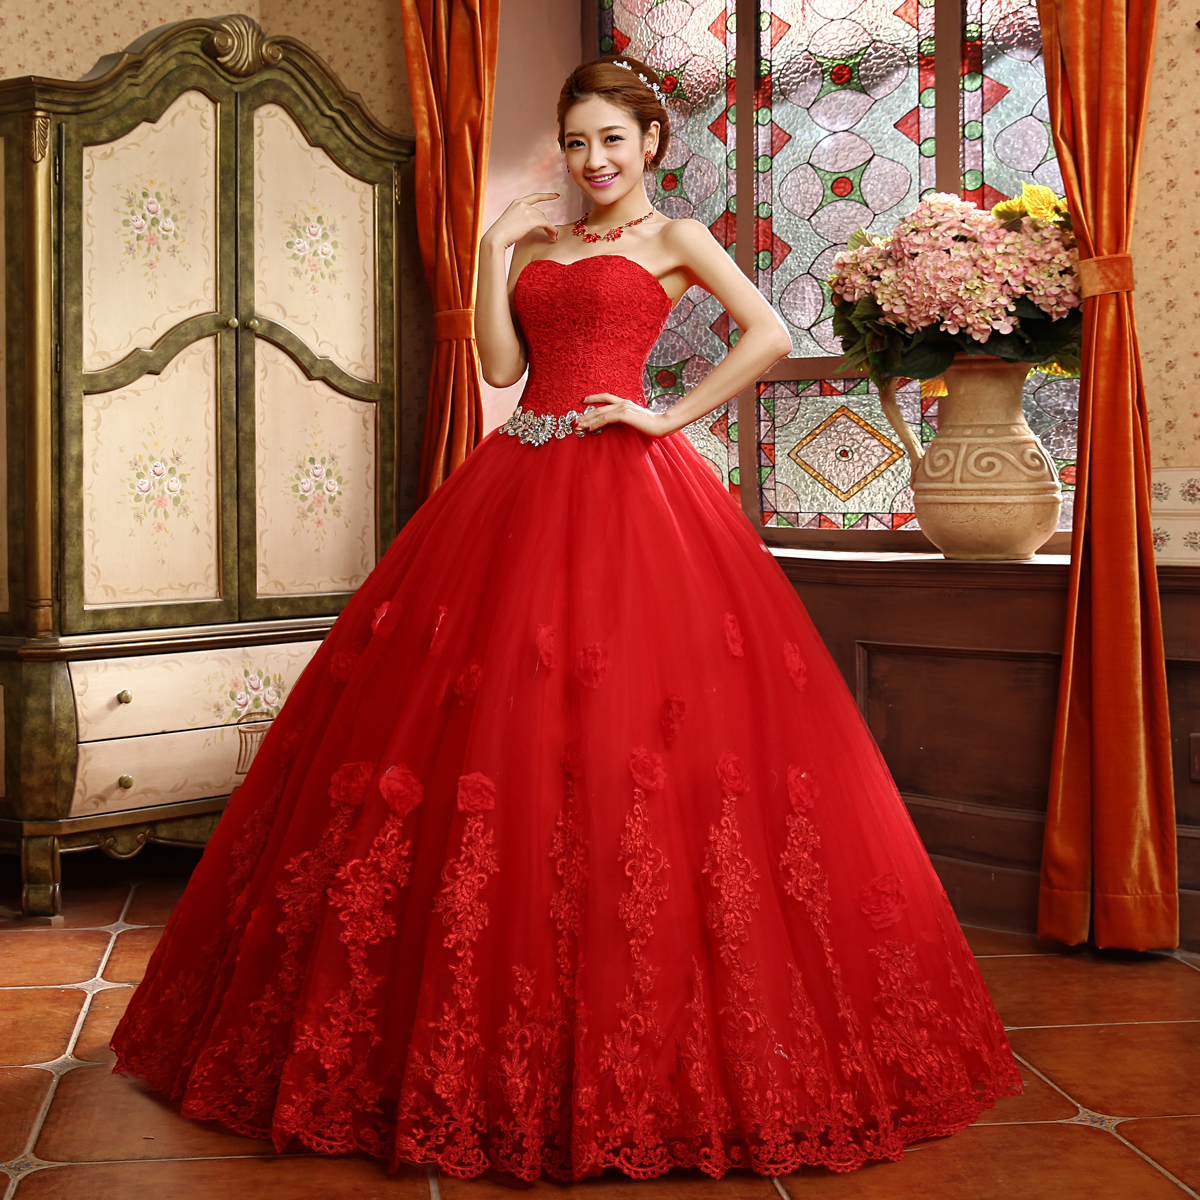 budget tea length wedding dress wedding dresses online cheap Picture wedding dress wedding dresses tea length wedding dresses short wedding dresses